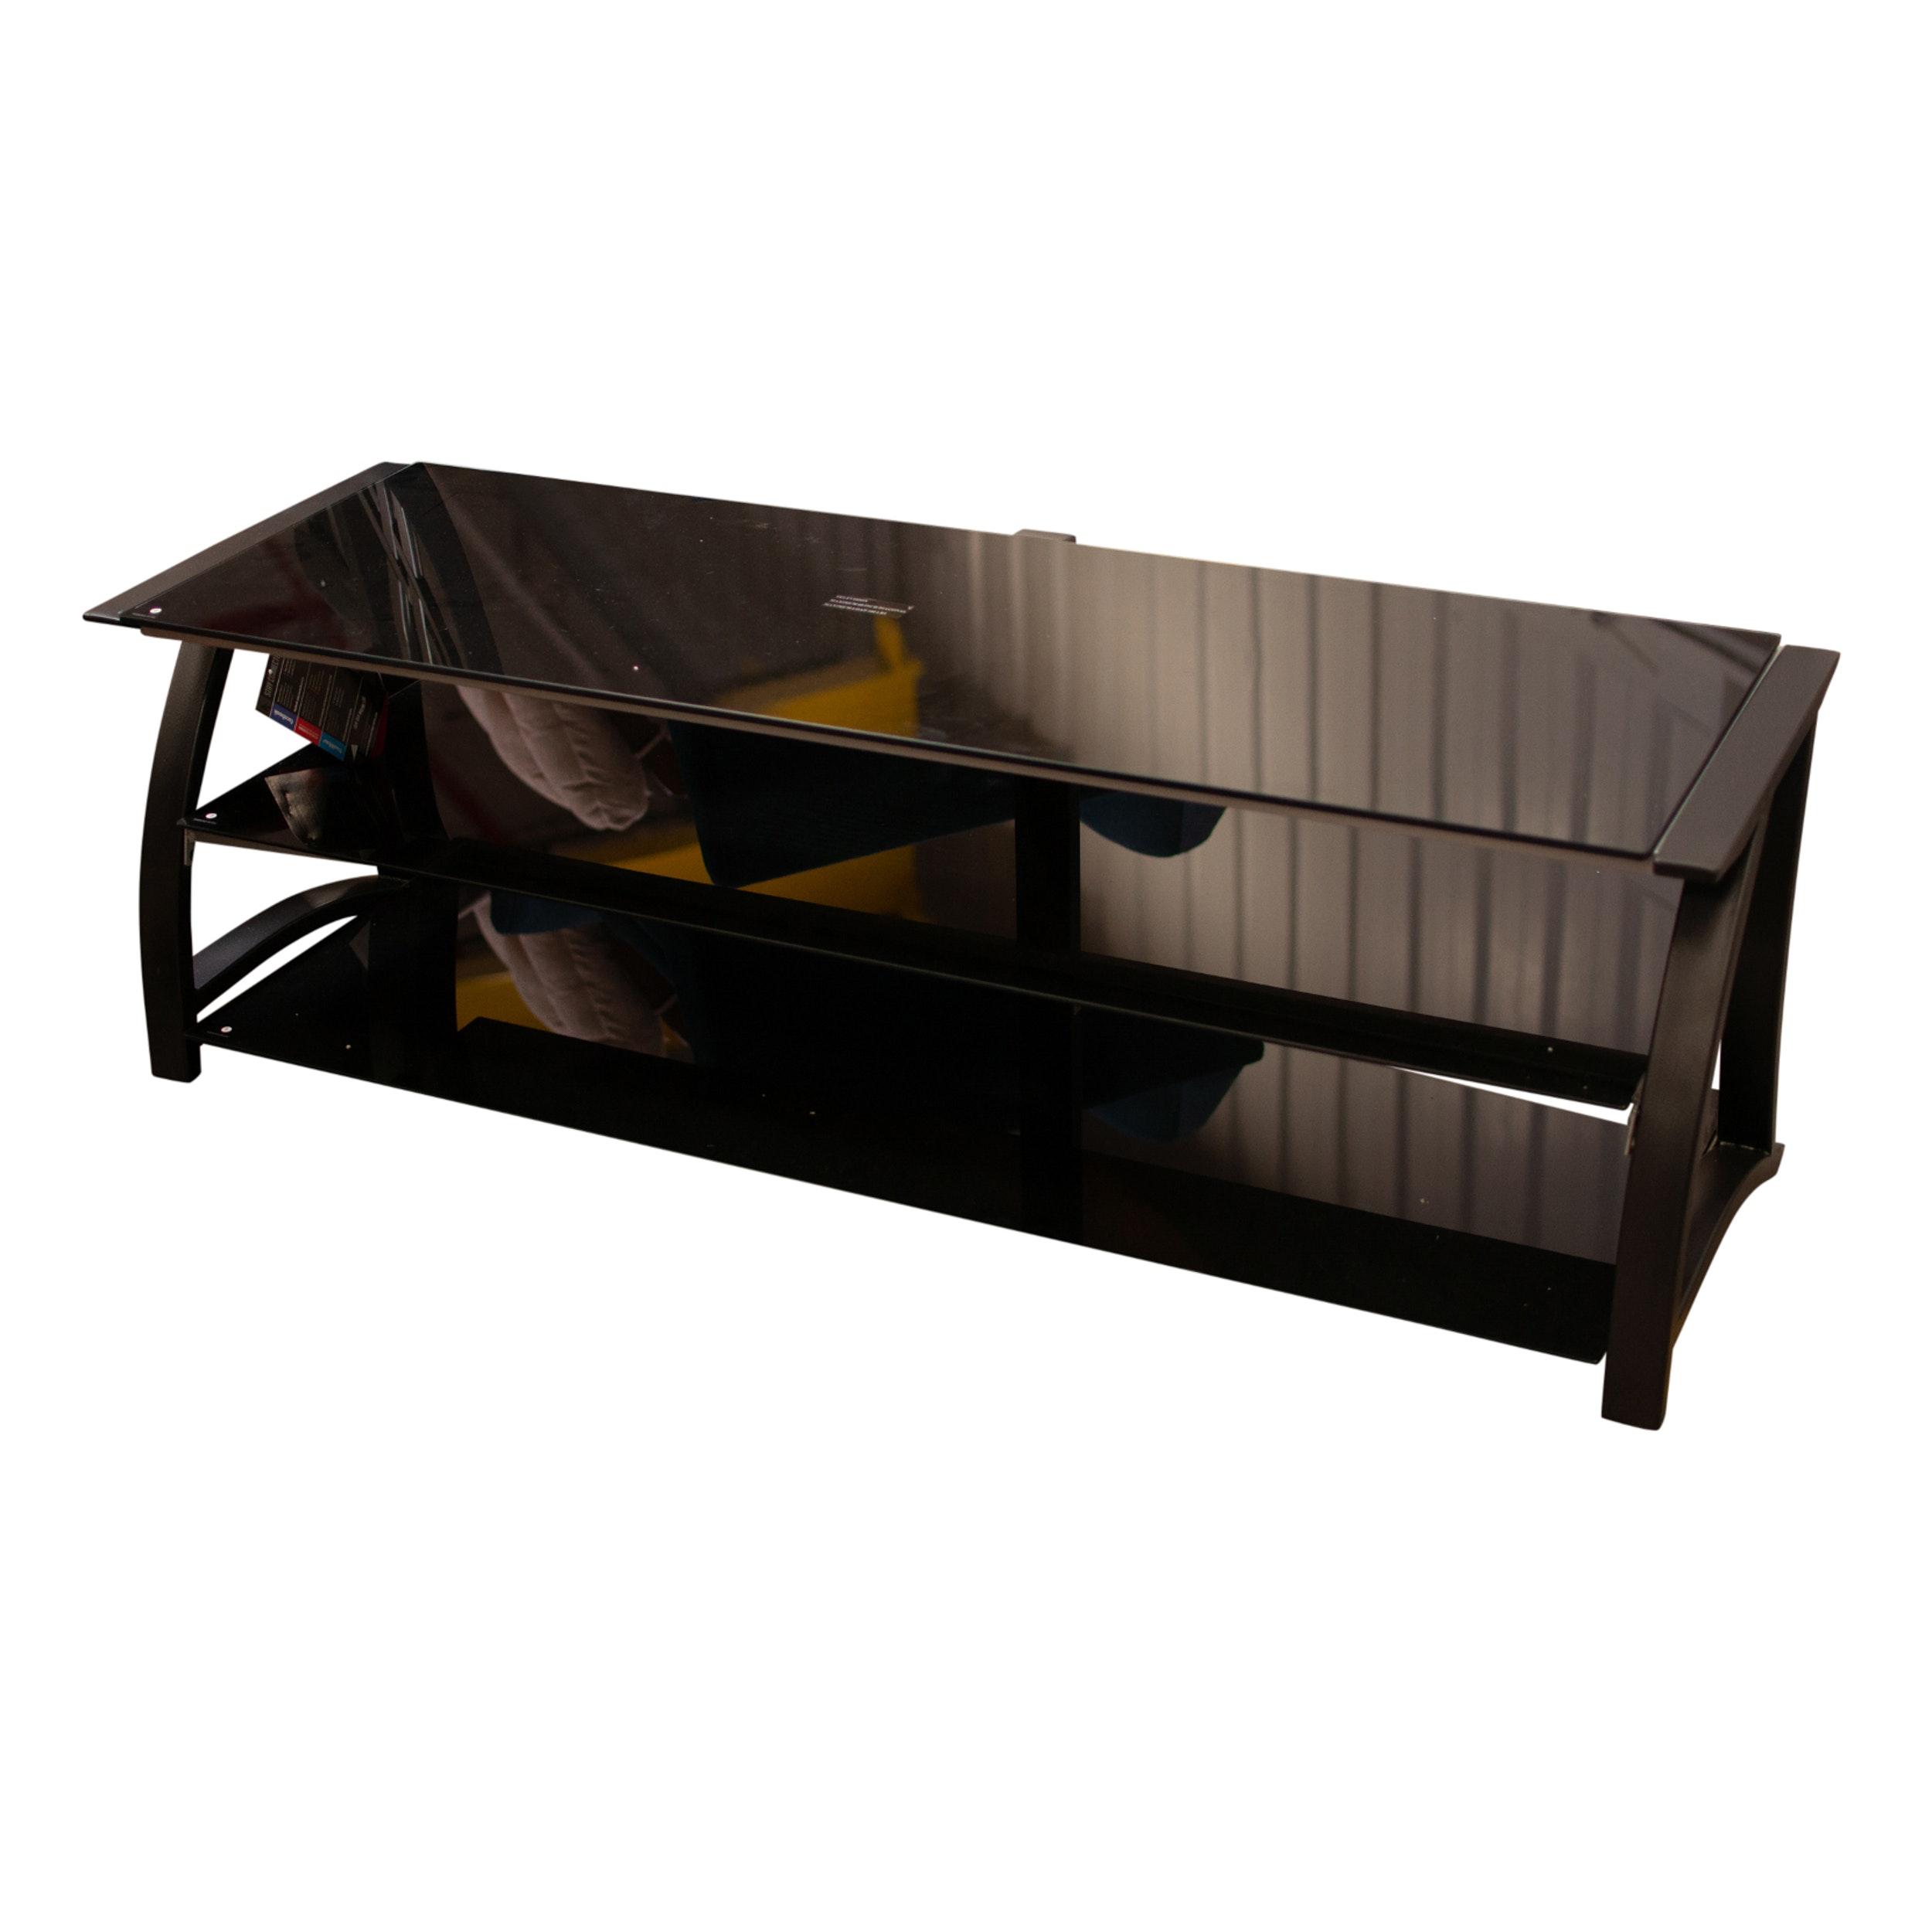 Coaster Furniture Console Media Table, Contemporary